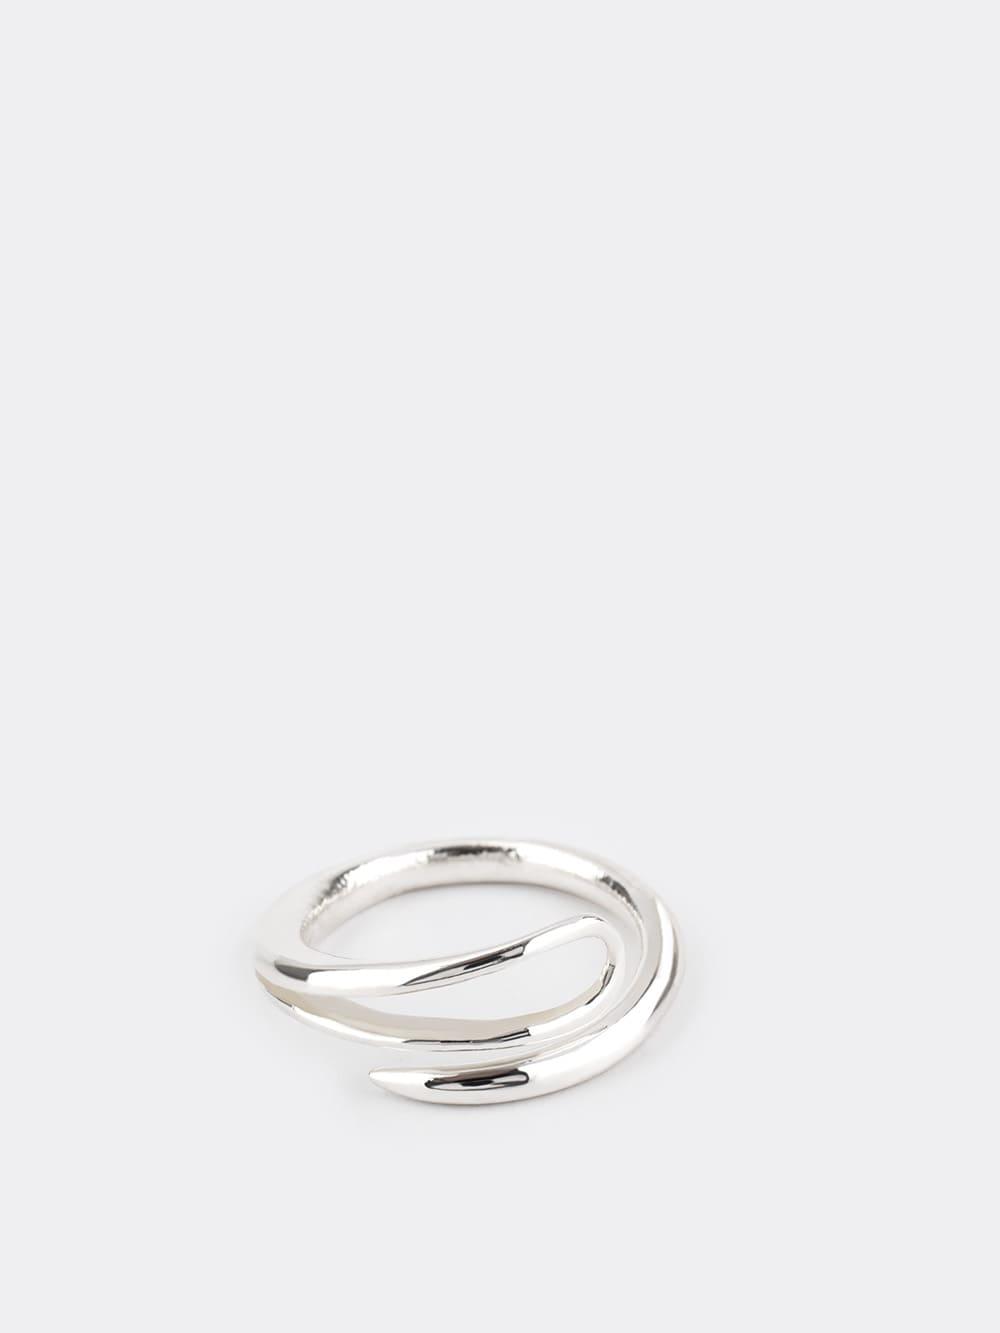 anillo de plata para mujer inspirado en aguja, joyas artesanales, joyas para regalar, marteliè barcelona, joyasmarket